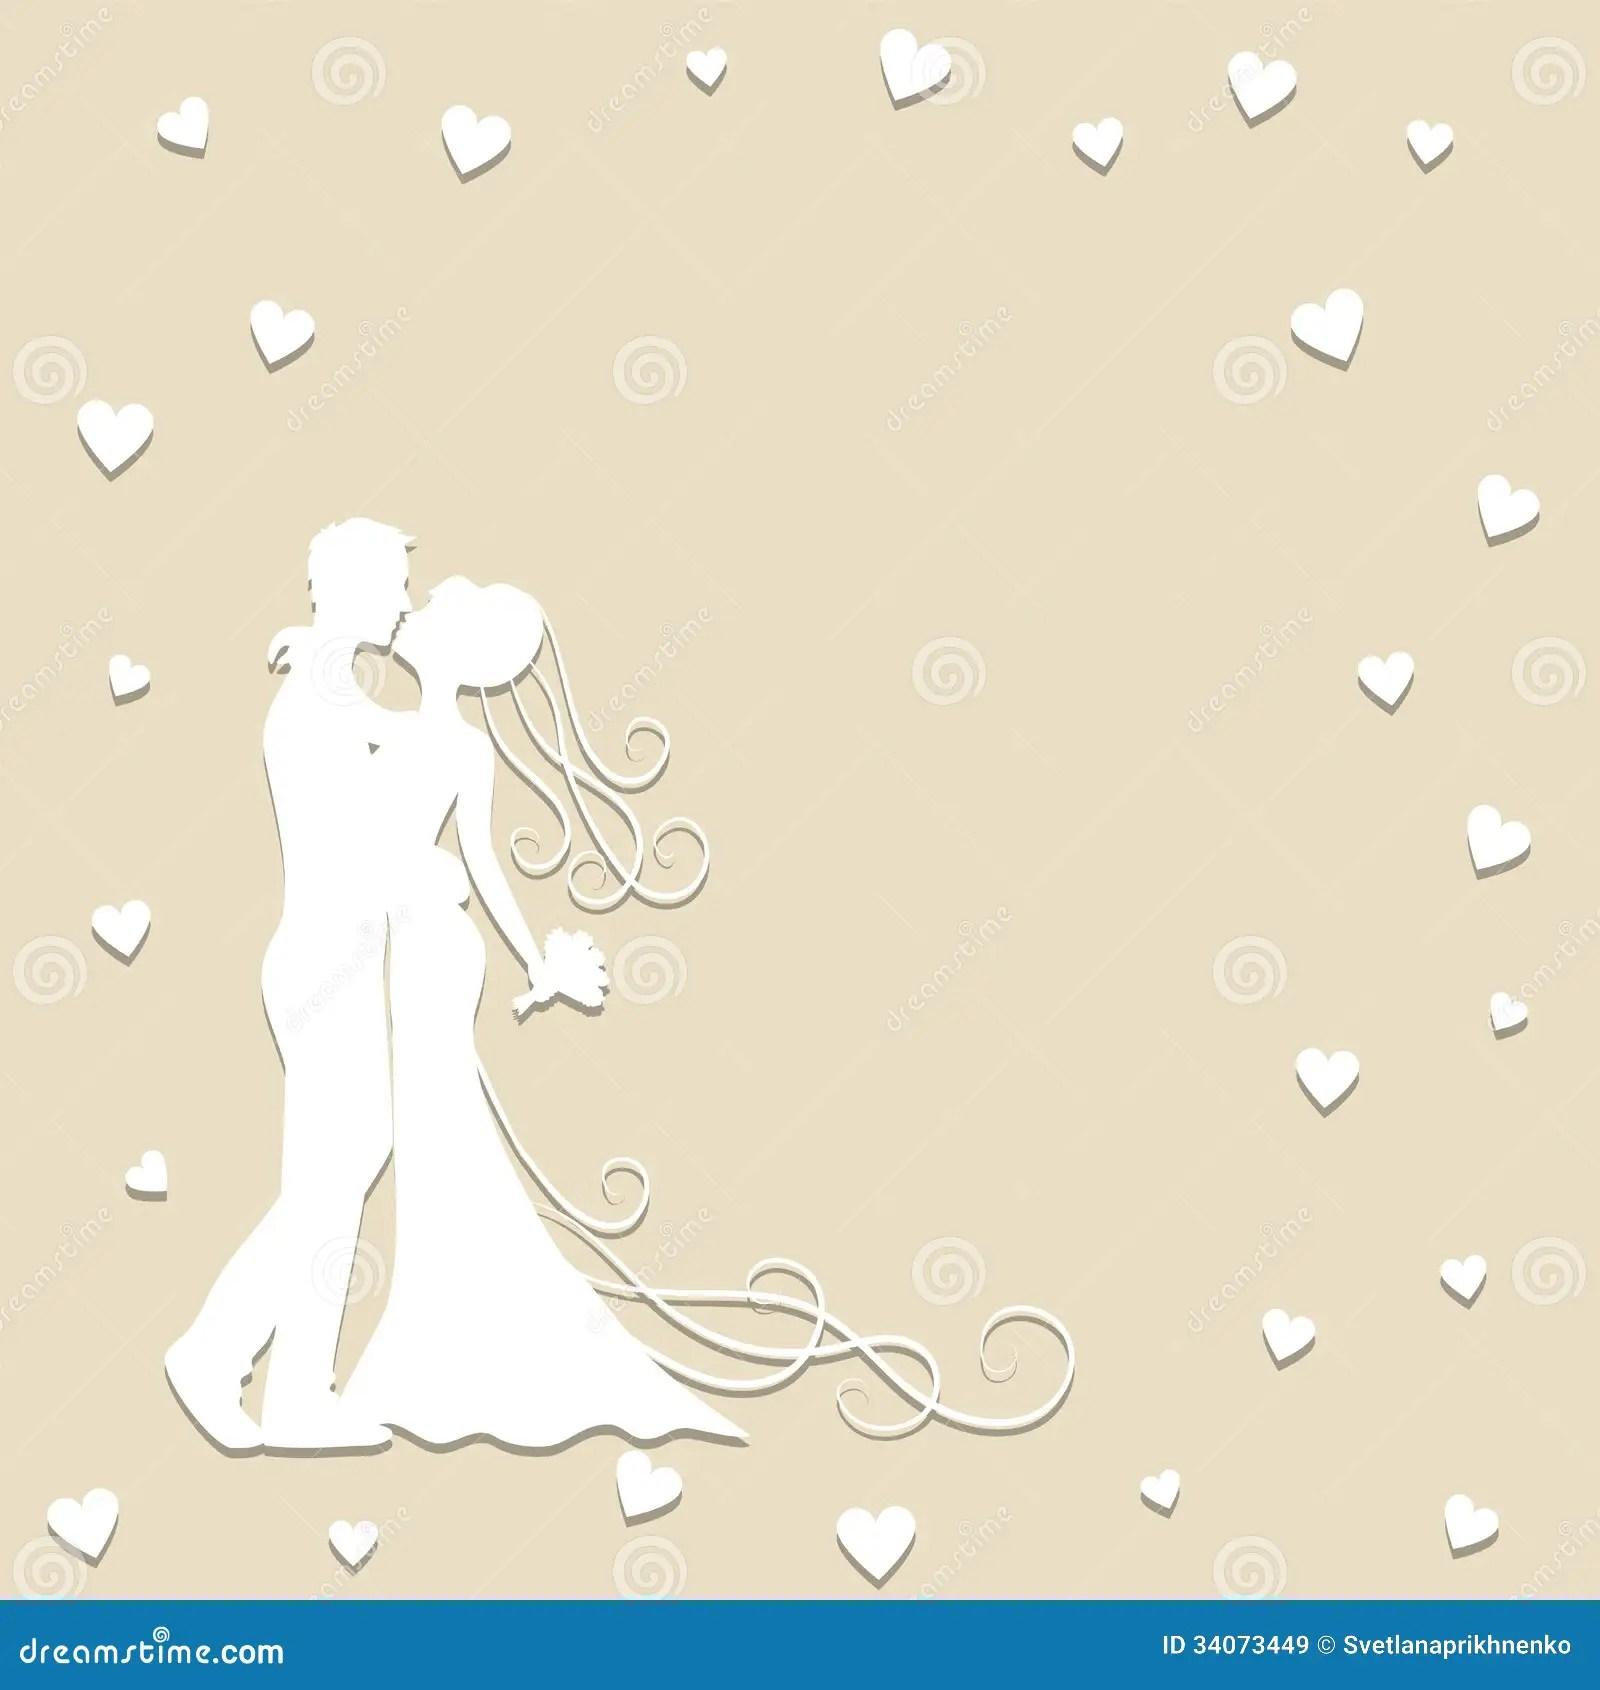 Personal Wedding Invitation